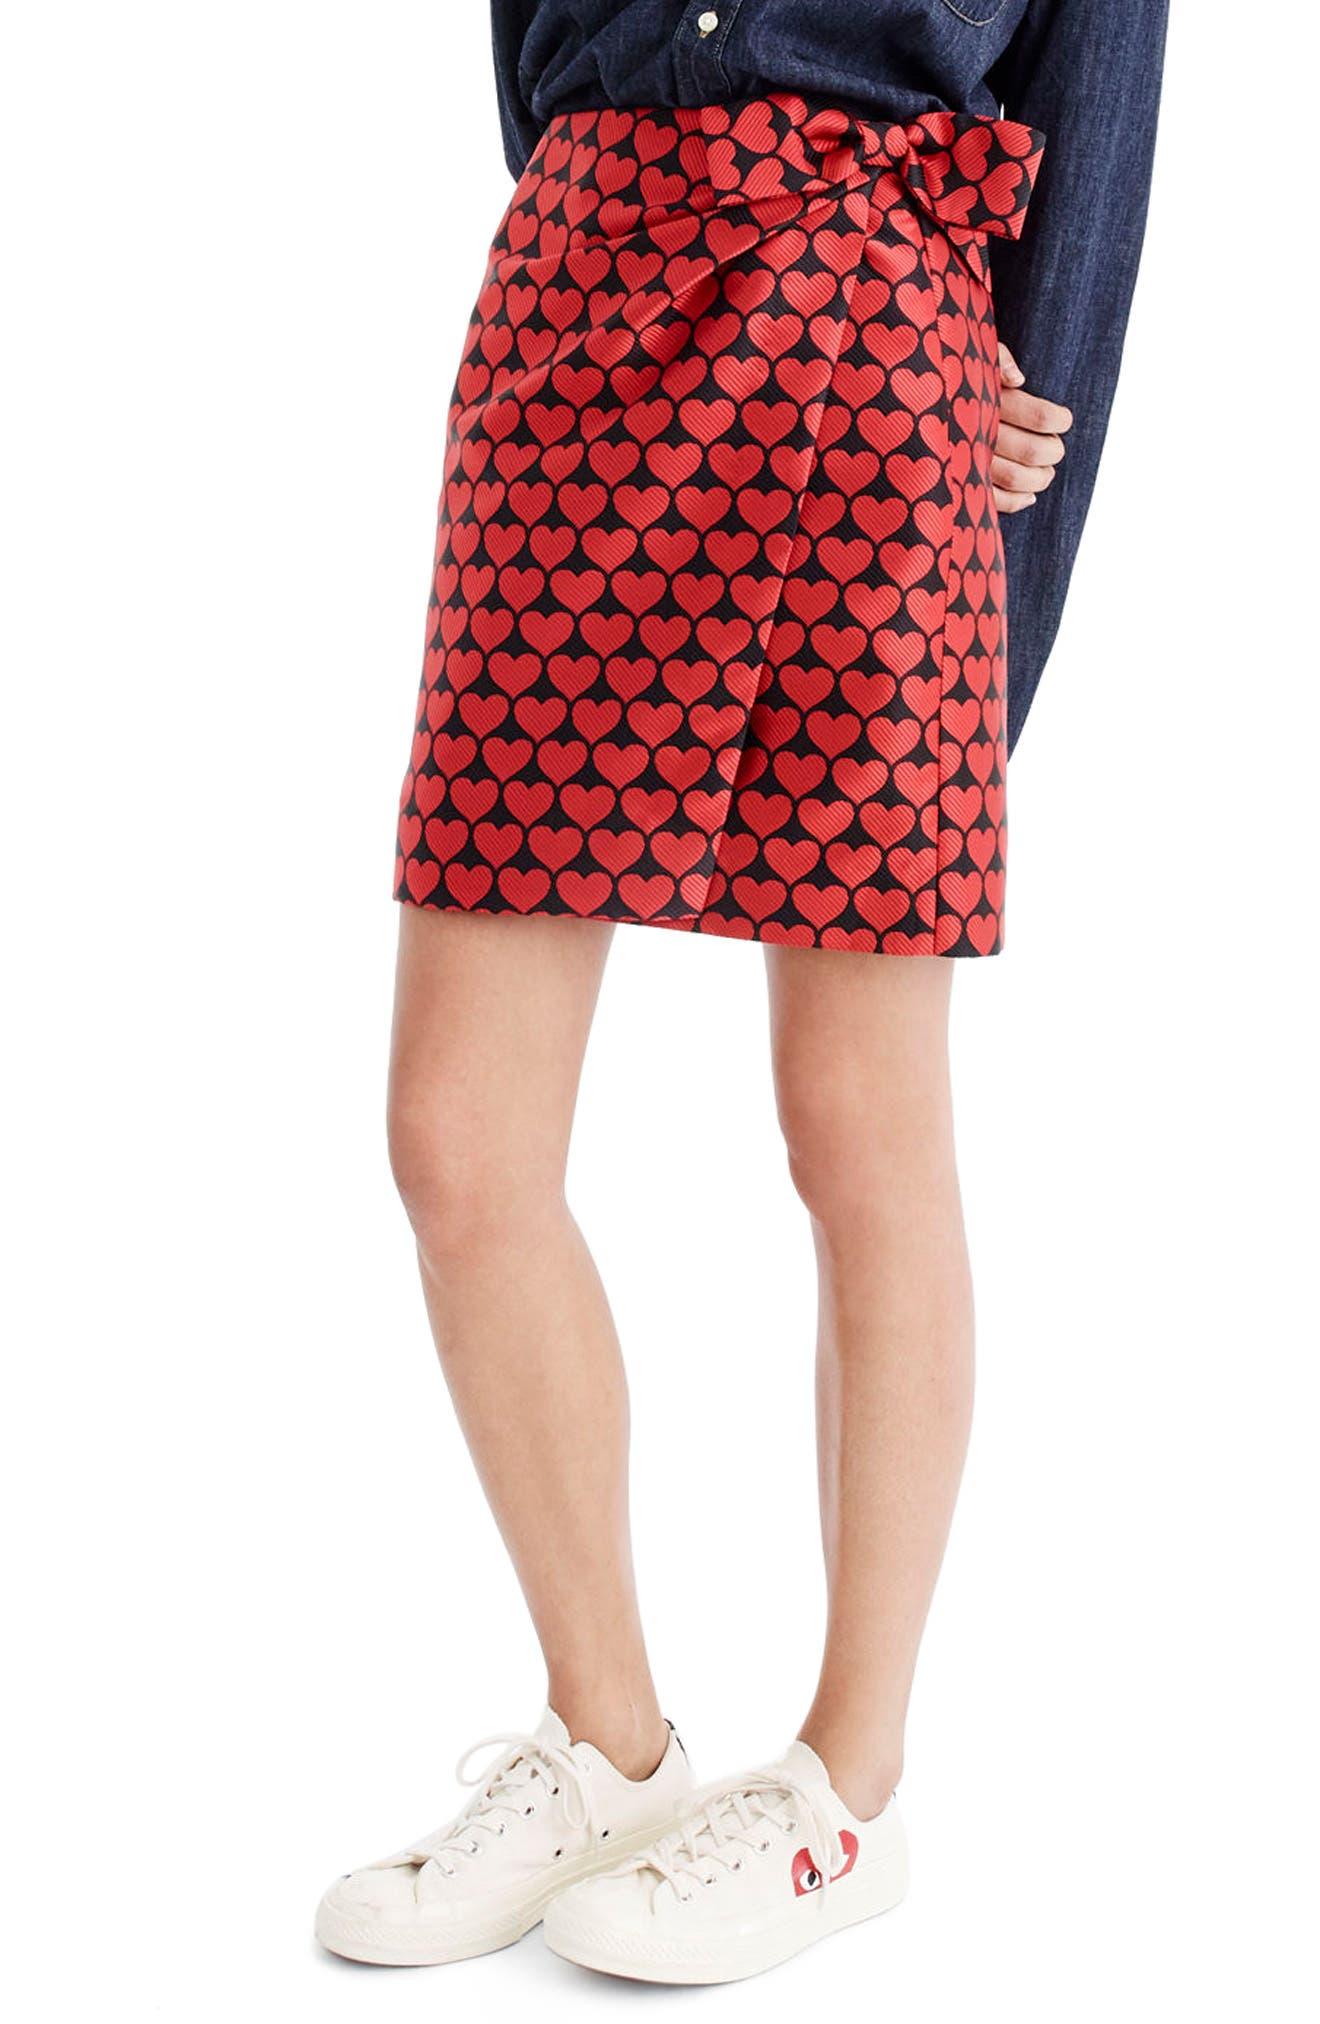 Castlebar Snuggle Heart Skirt,                             Main thumbnail 1, color,                             600